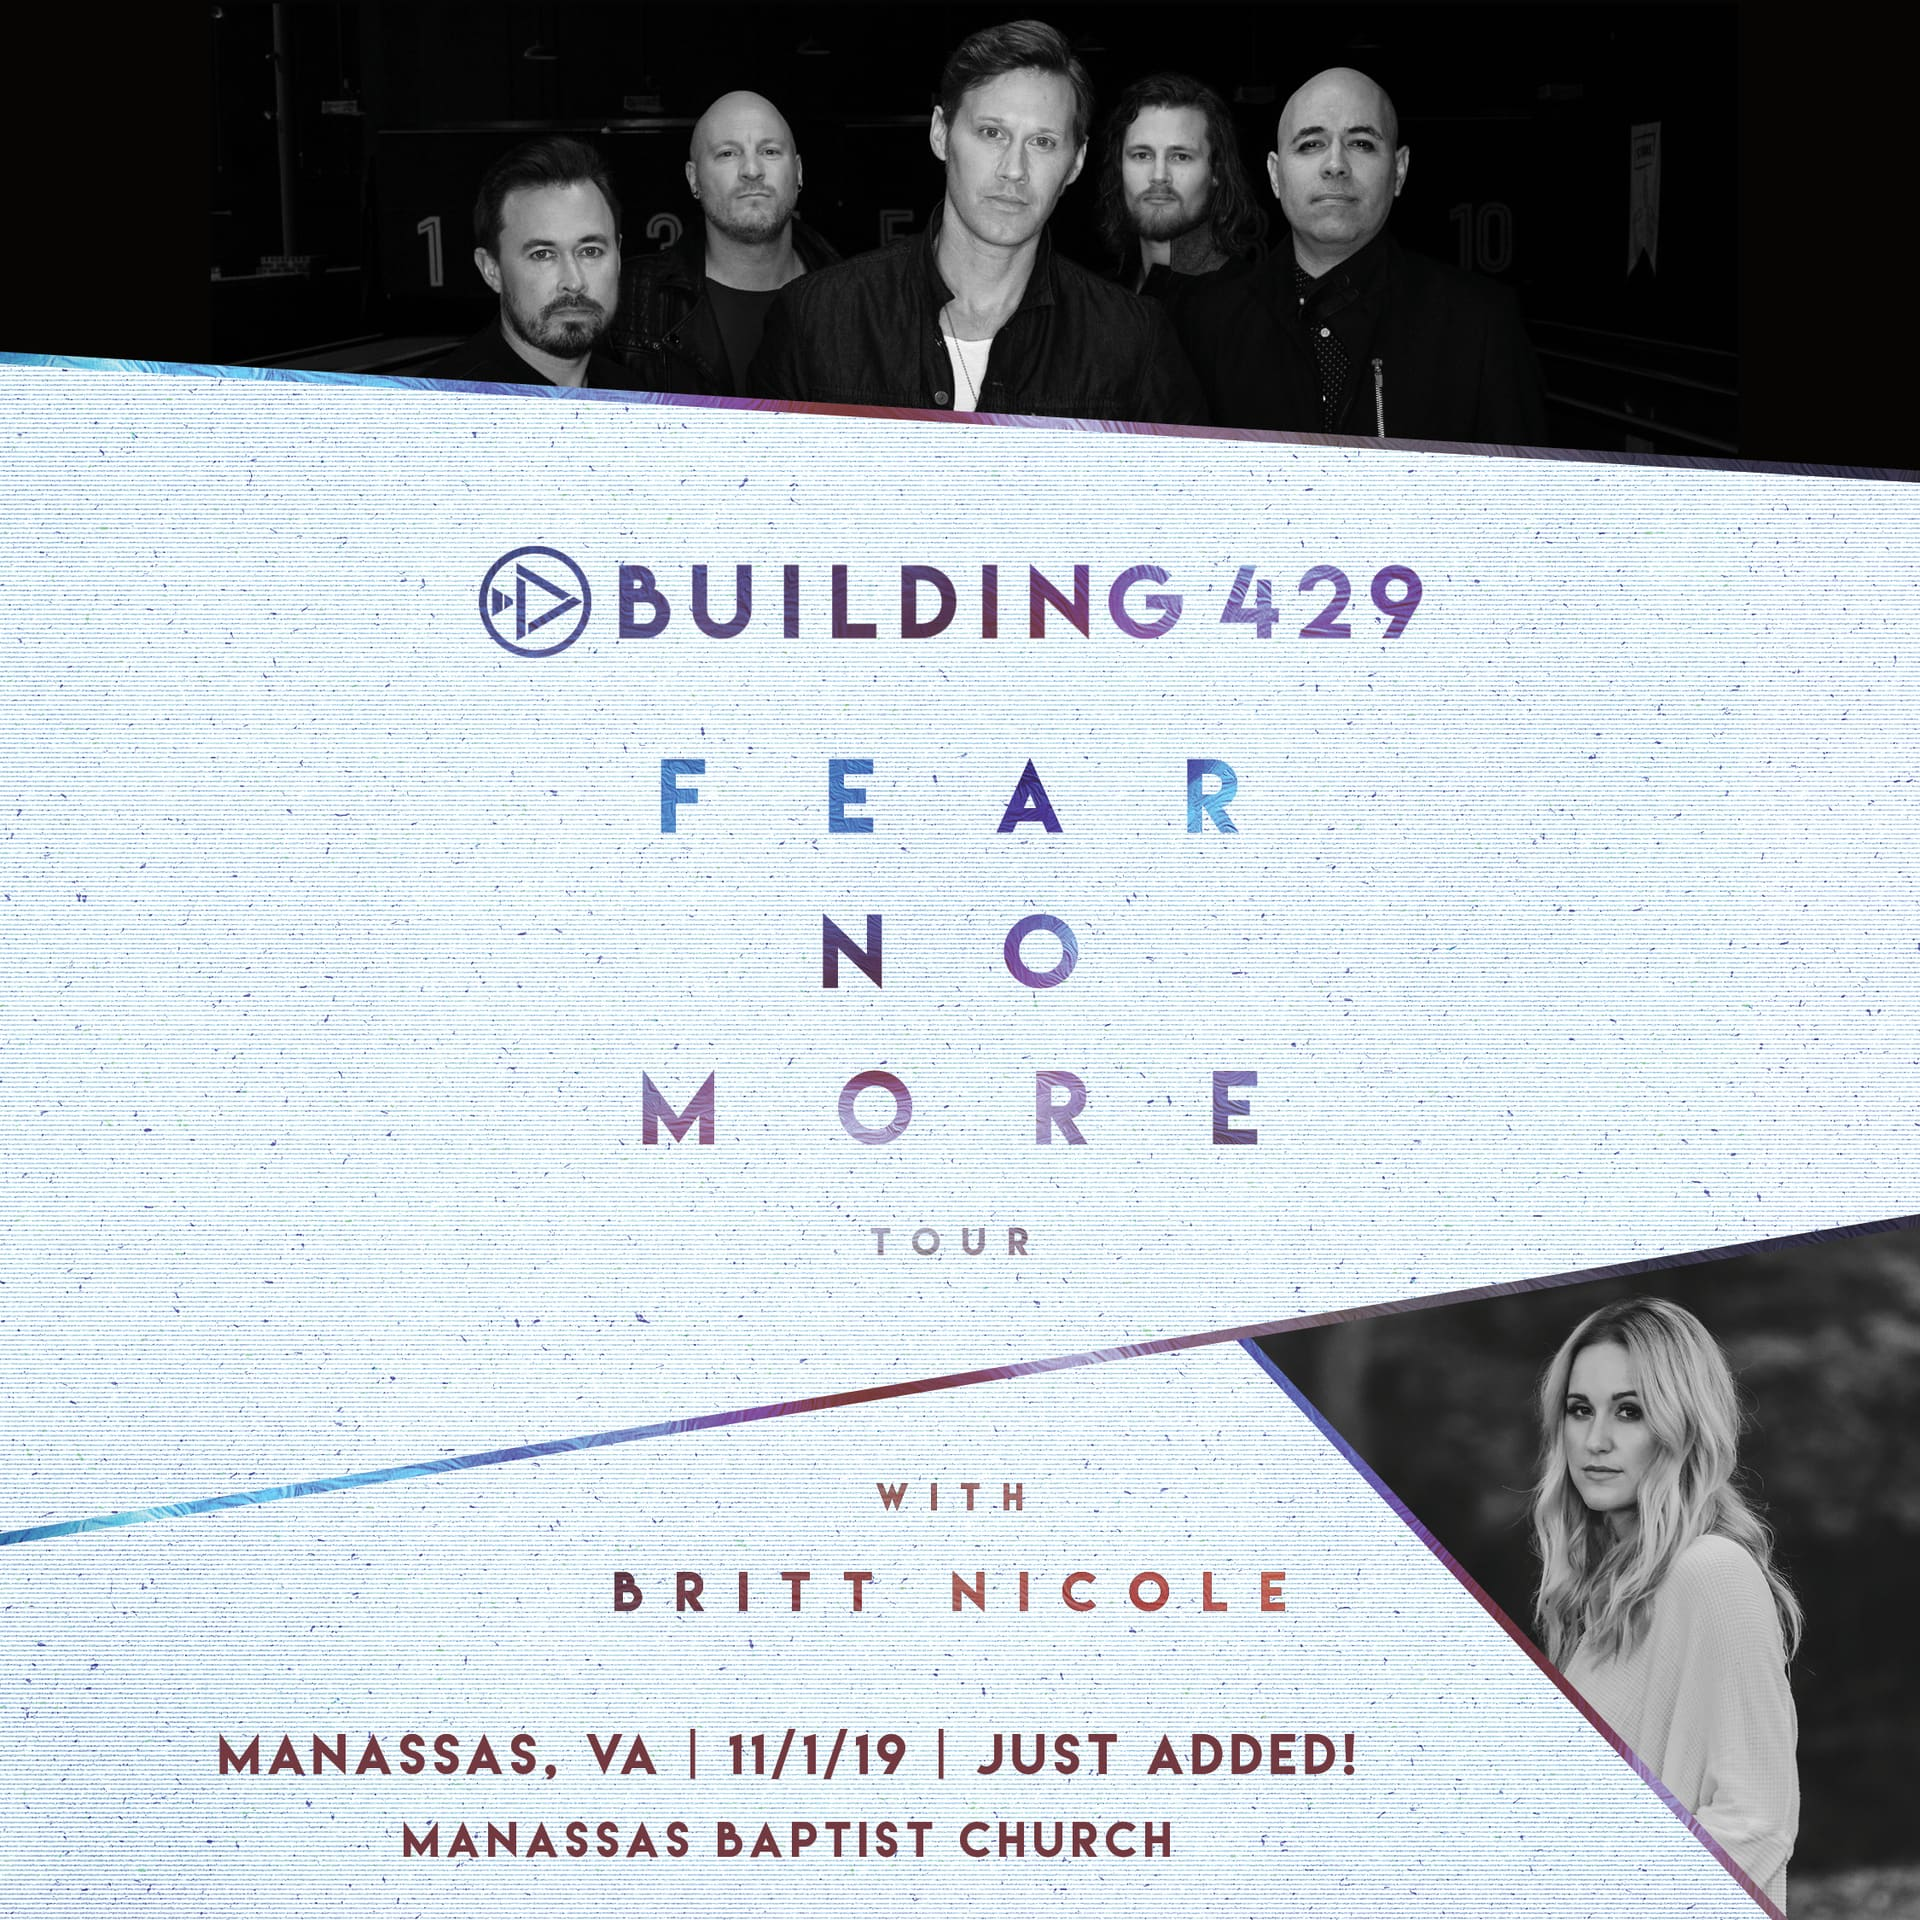 Building 429 Concert